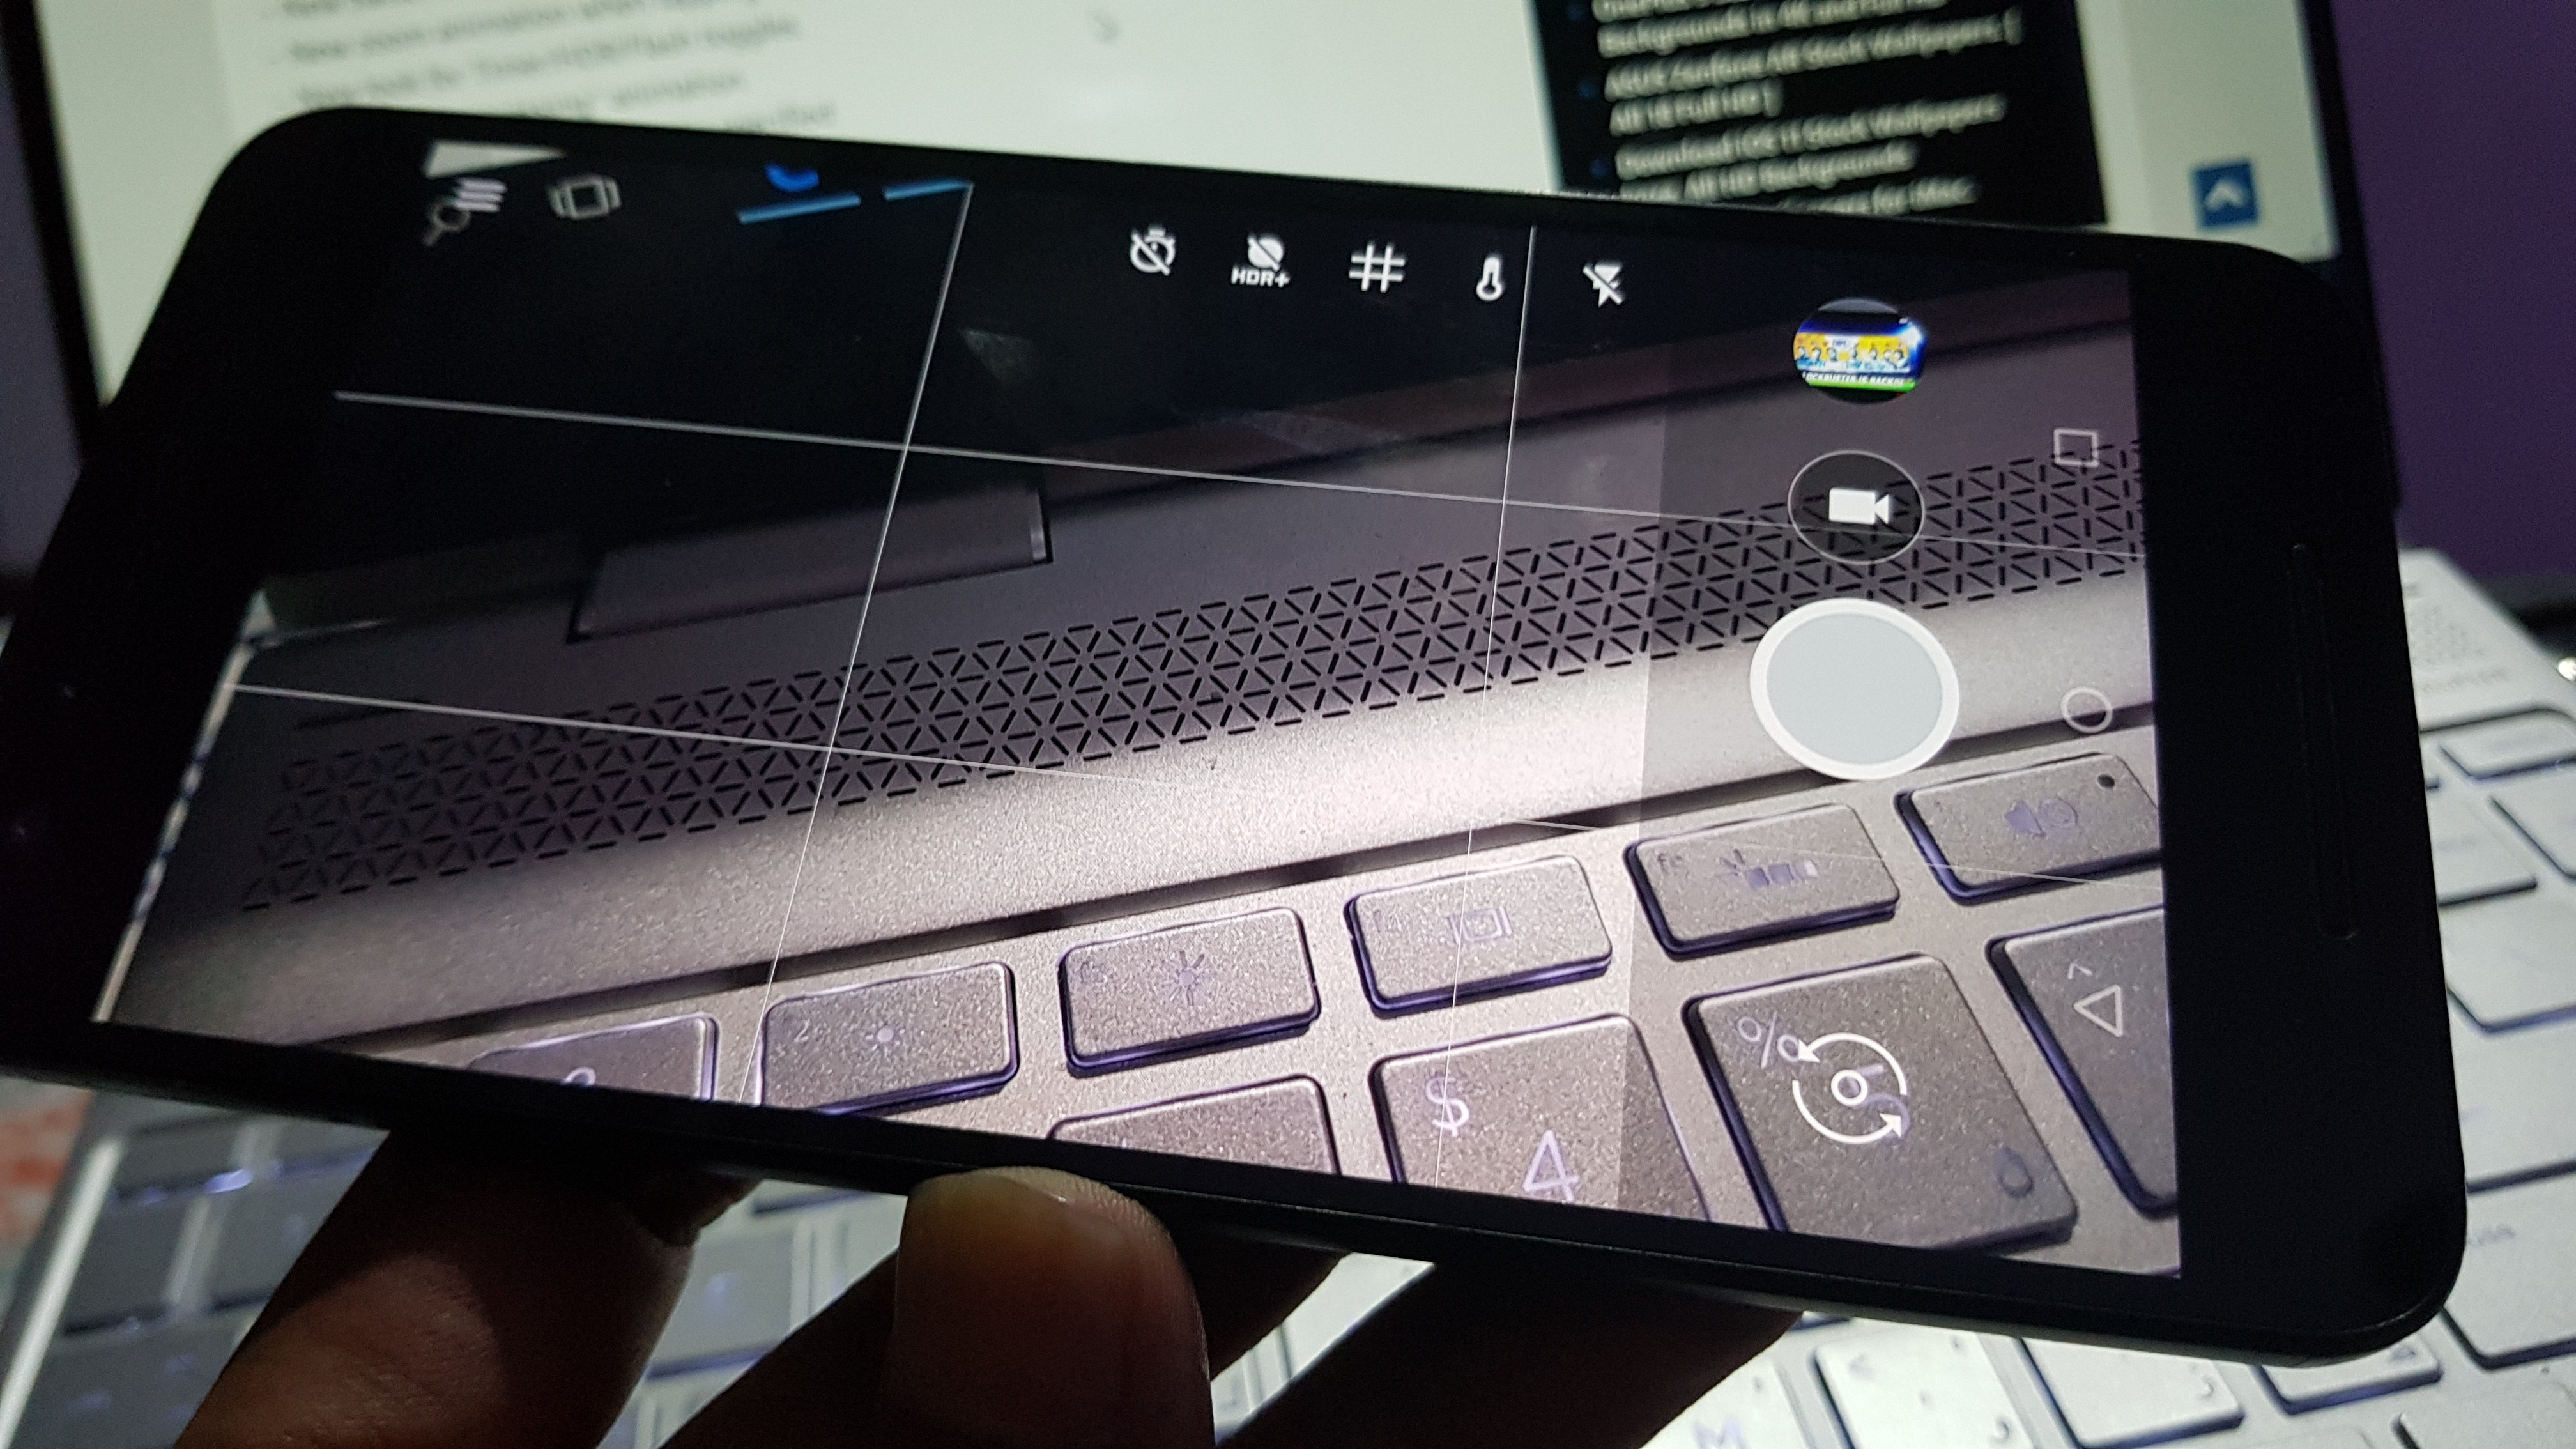 Google-Camera-4.4-Apk-Android-8-Orio (2)